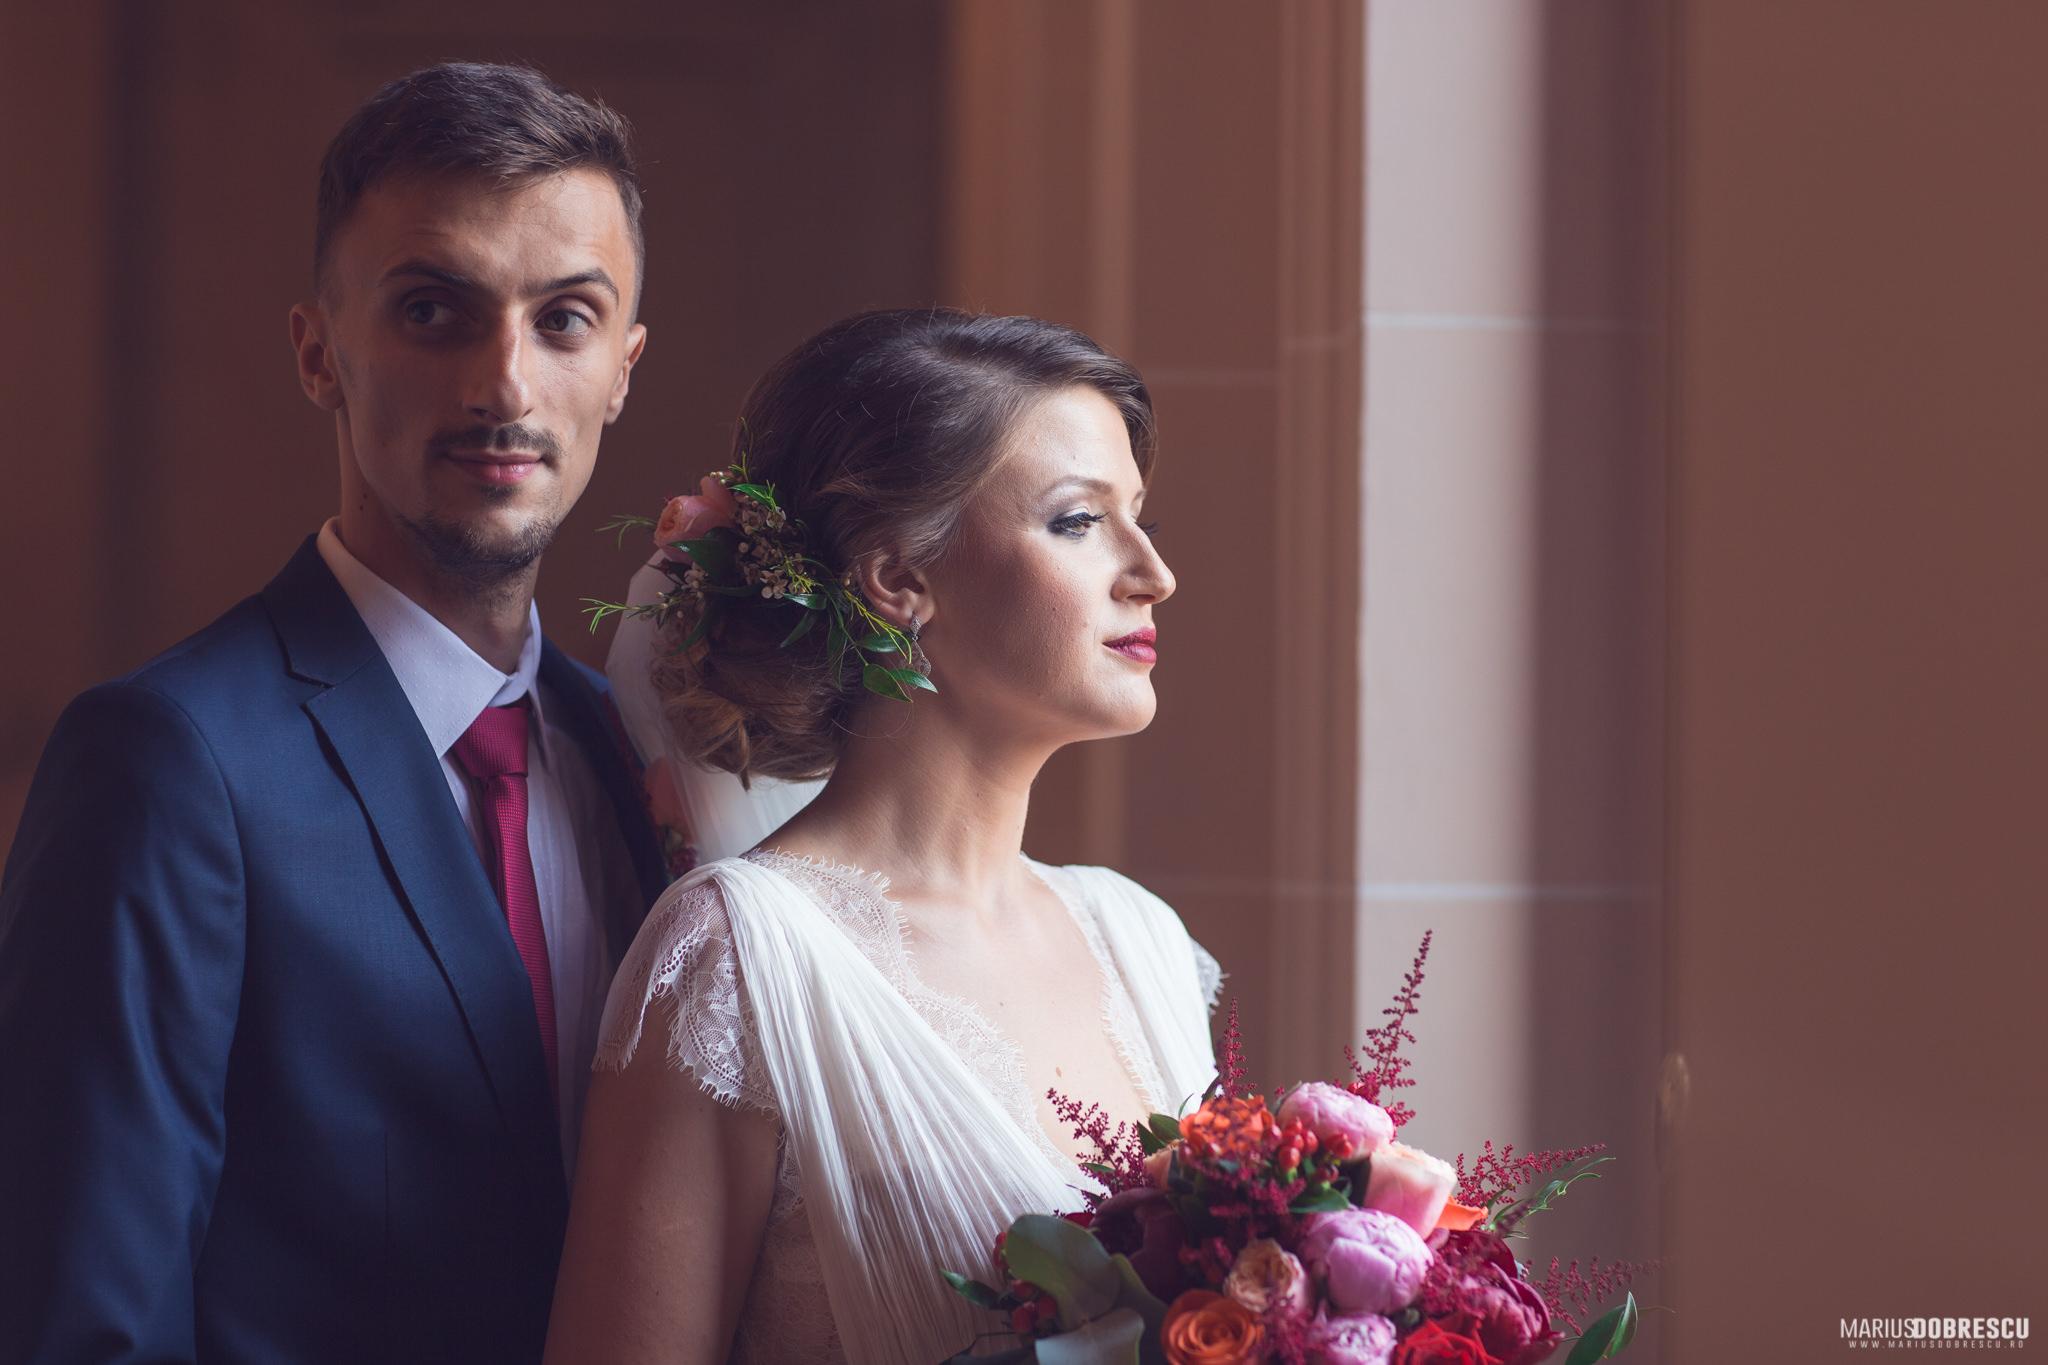 Fotograf nunta Ploiesti - Marius Dobrescu 21